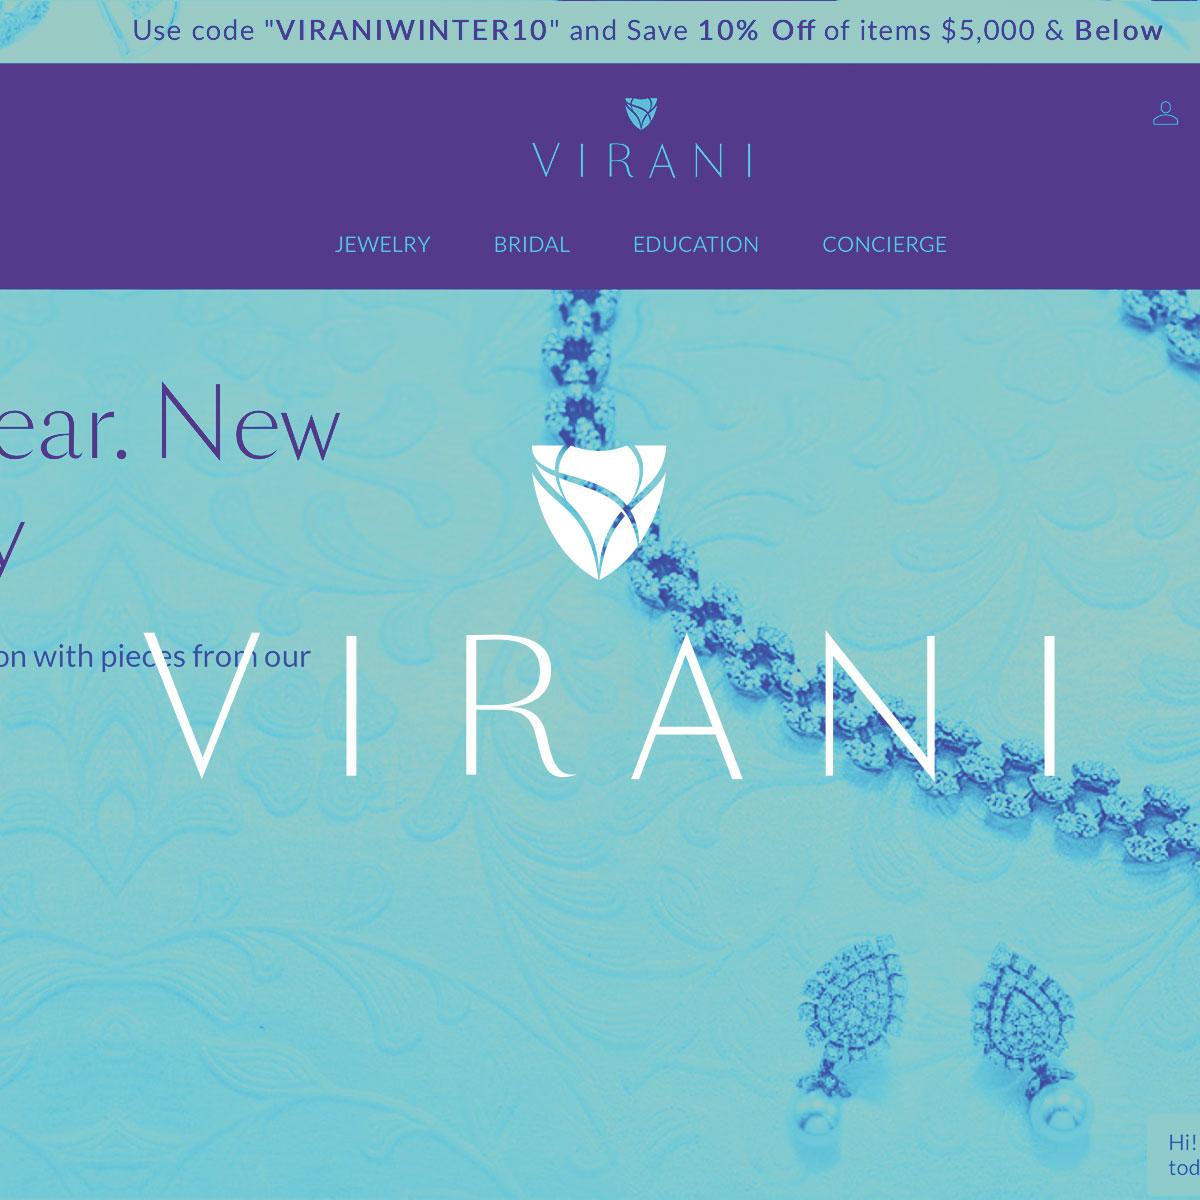 LUXury JEWELRY E-COMMERCE - Virani Jewelers - Responsive